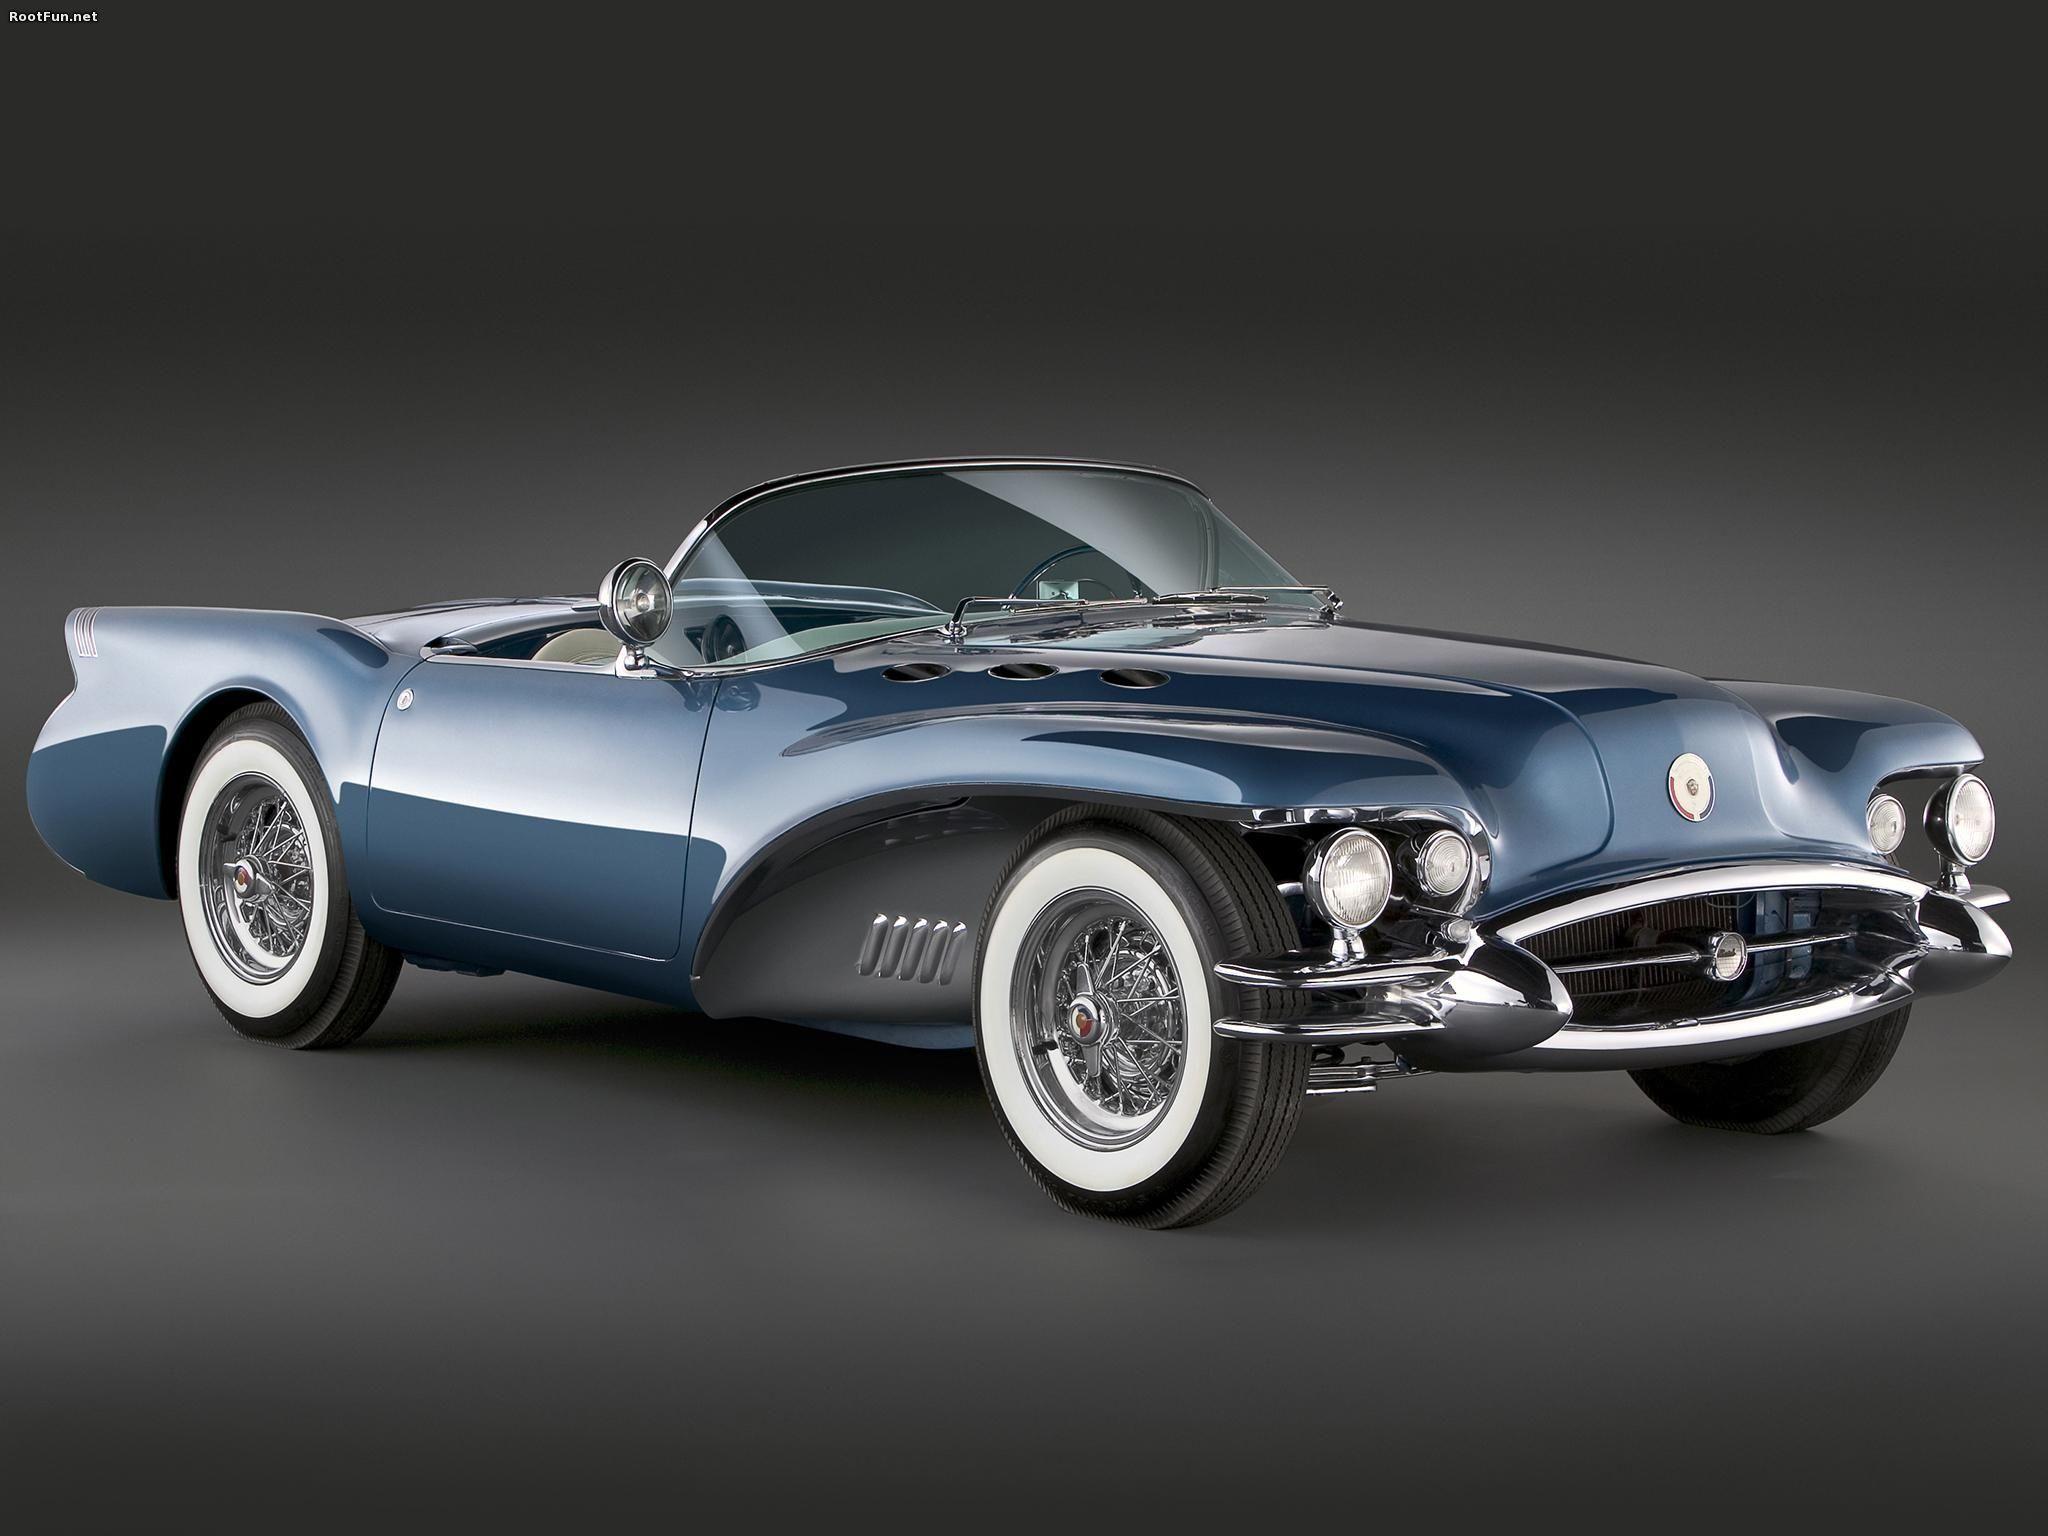 Buick Wildcat Ii Motor Vehicles 02 Roadsters Pinterest Cars 51 Lesabre Concept 1954 Car Designer Harley Earl